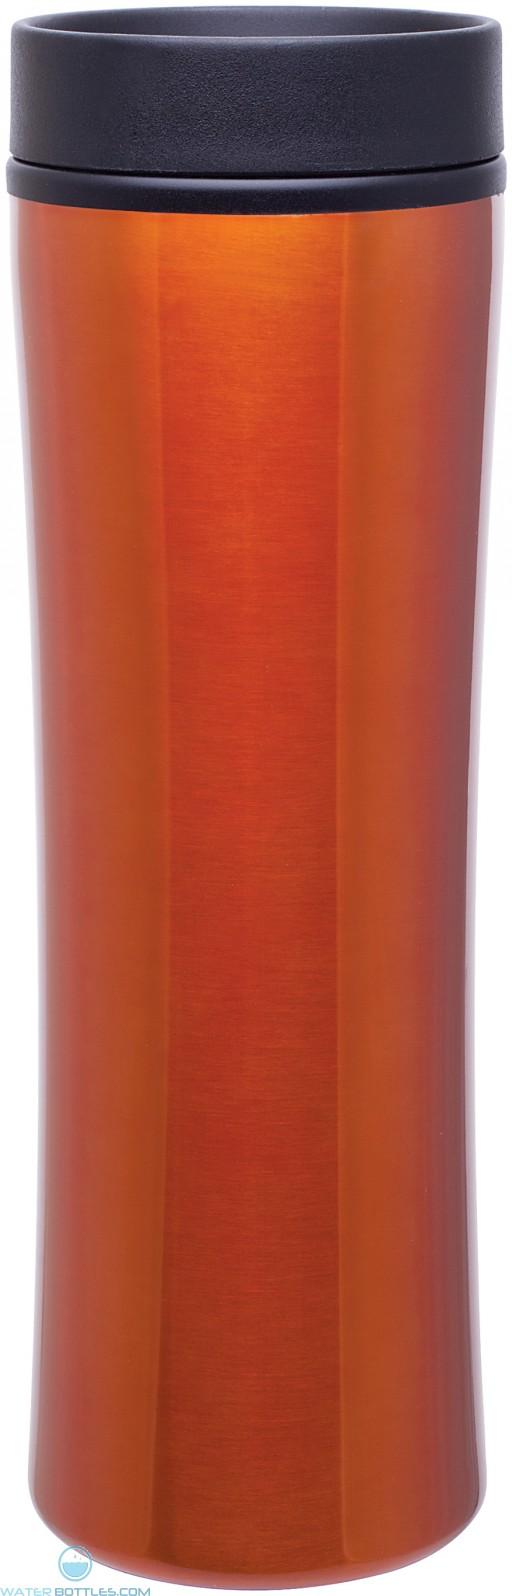 Foam Insulated Cyrus Tumblers | 16 oz - Orange